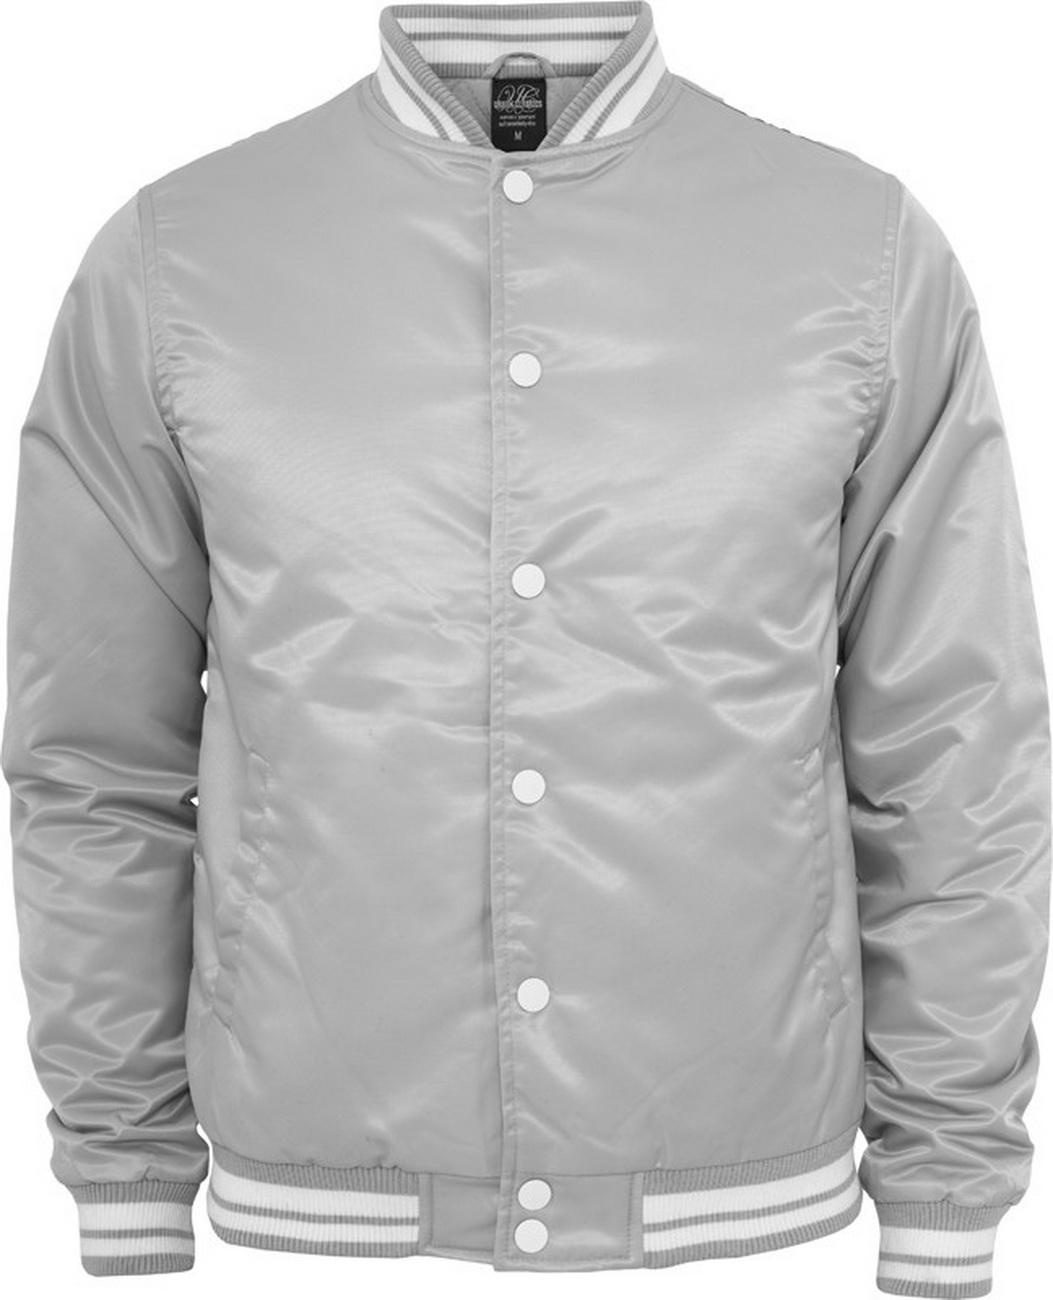 Urban Classics Herren Shiny College Jacke - Slim Fit